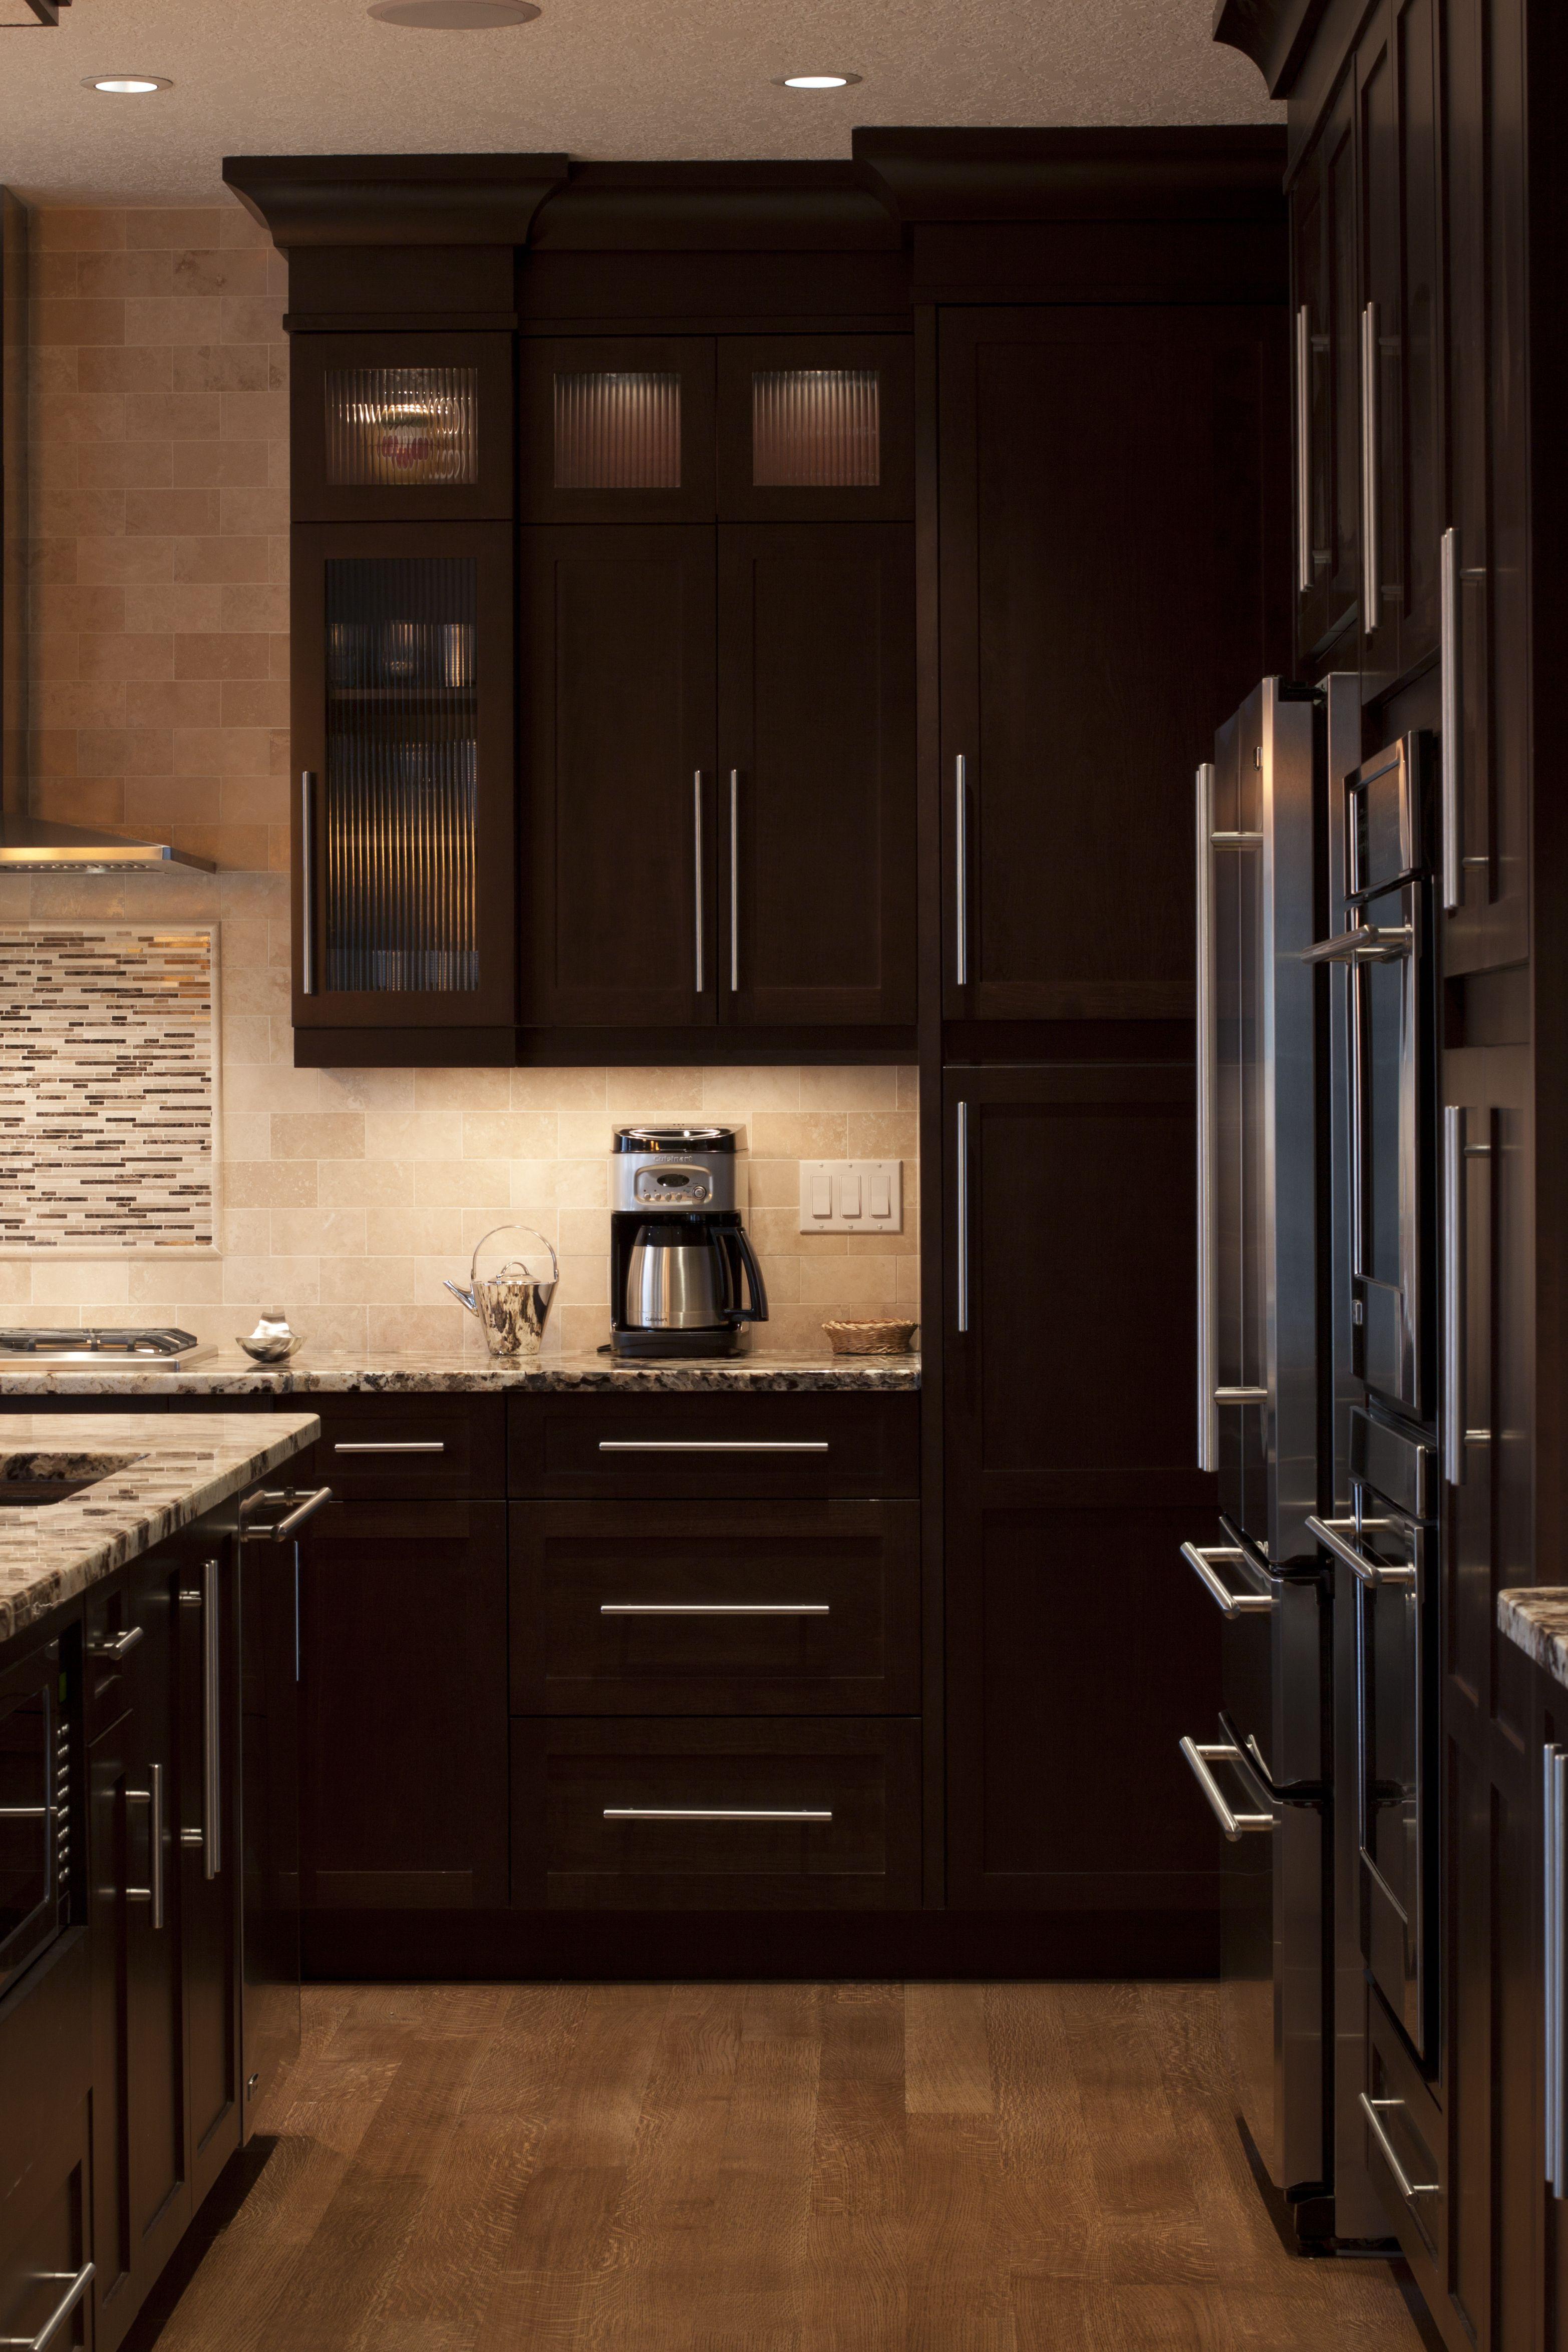 Kitchen Renovations Calgary, kitchen cabinets Calgary ...